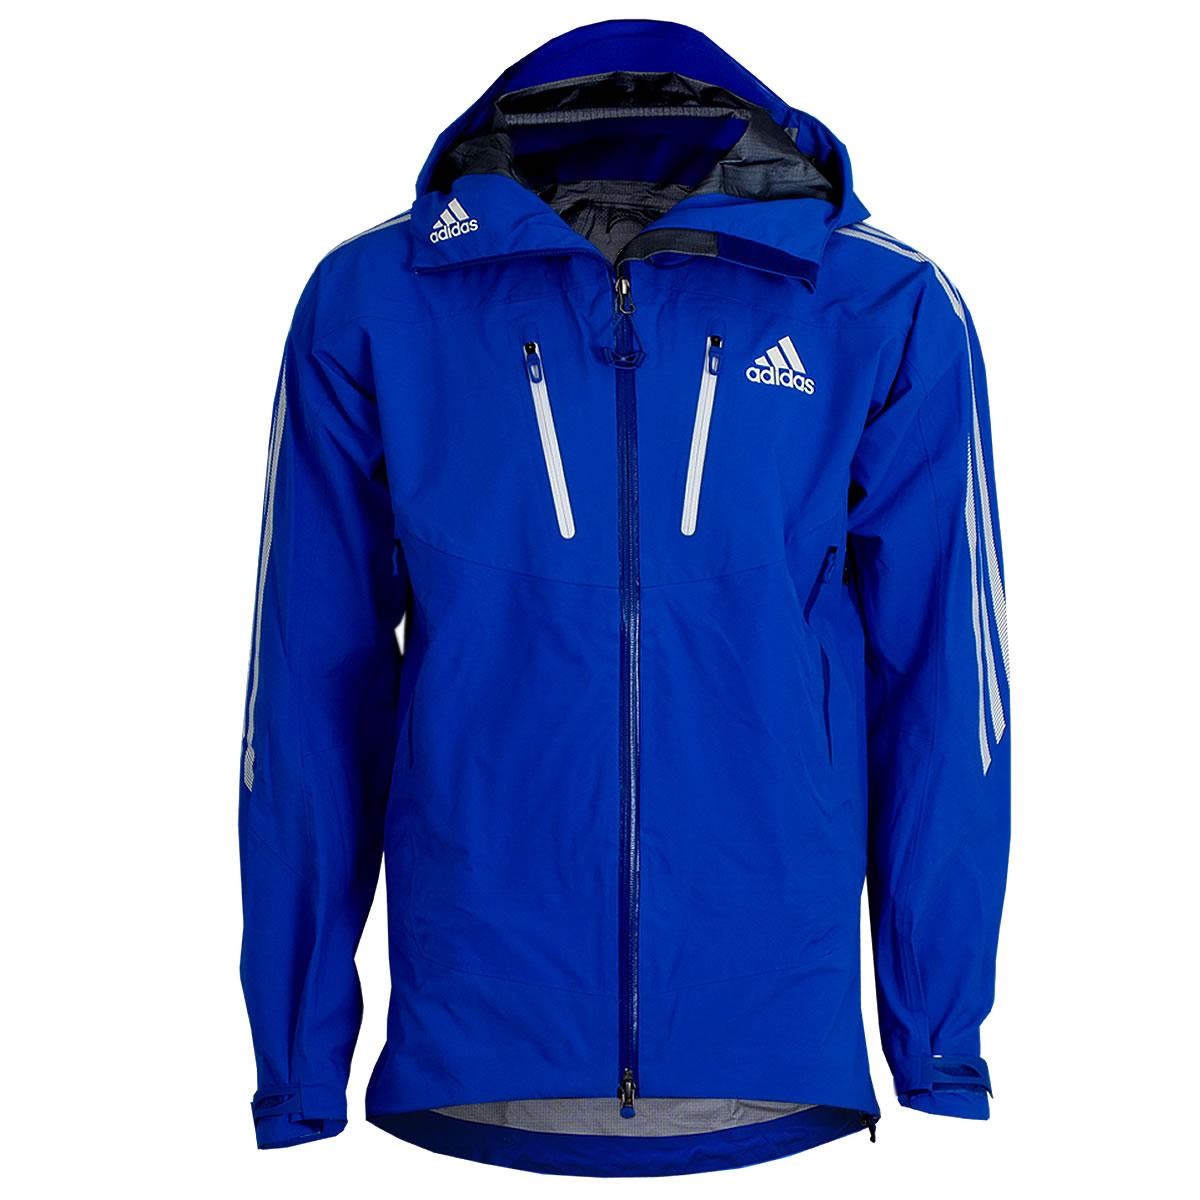 adidas Herren Terrex Icefeather Jacke Gore-Tex Pro Outdoor Jacket blau-weiß  NEU 1795ad2f81